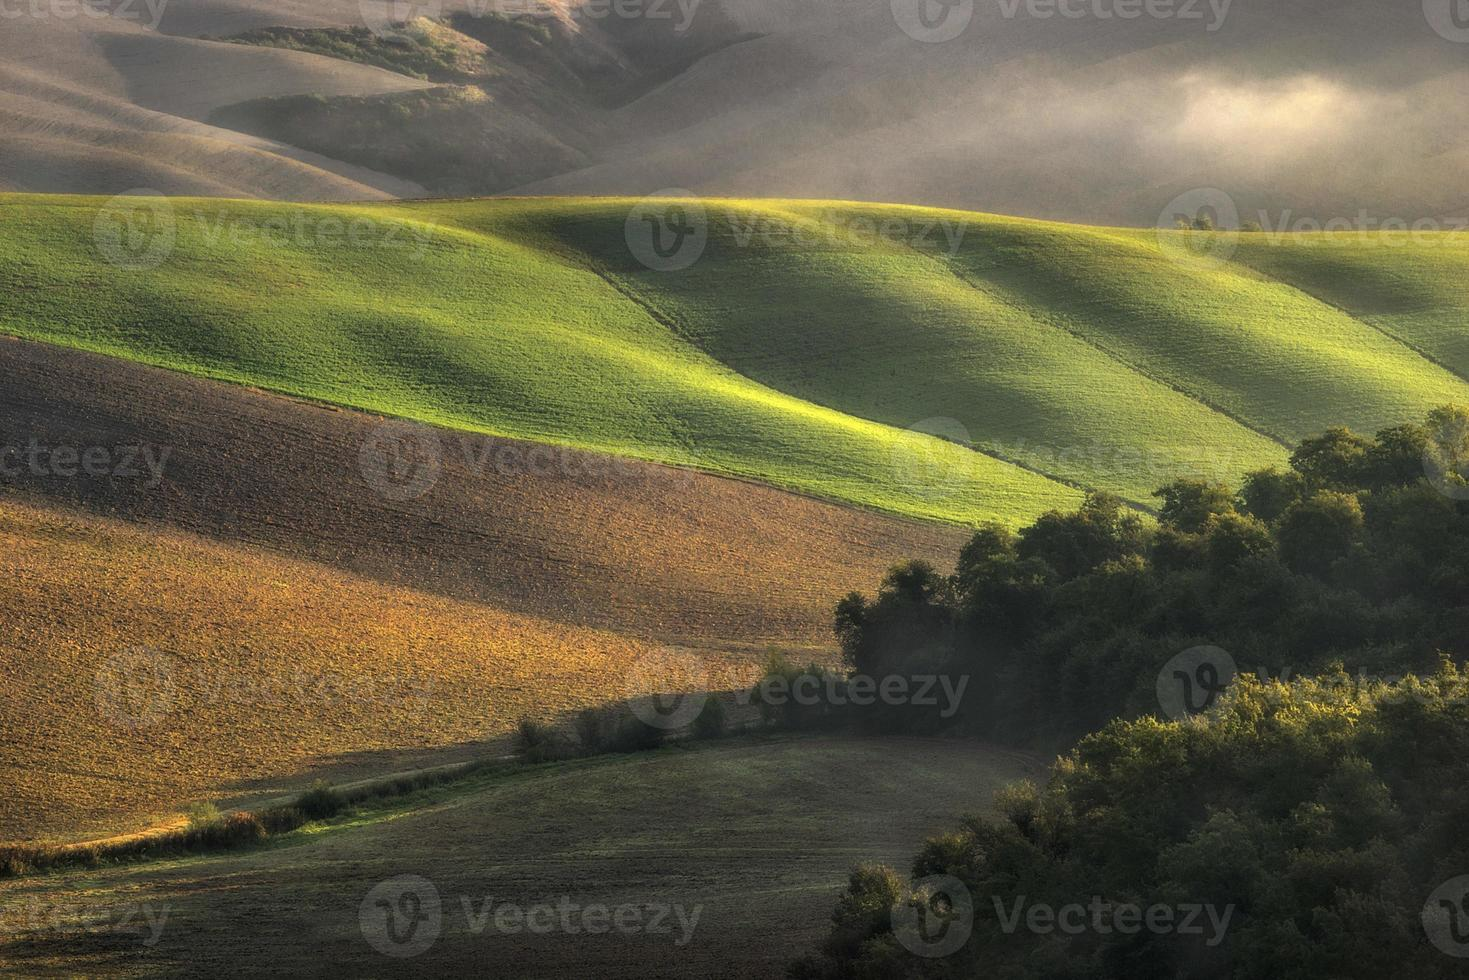 Toskana - Landschaftspanorama, Hügel und Wiese, Toskana - Italien foto